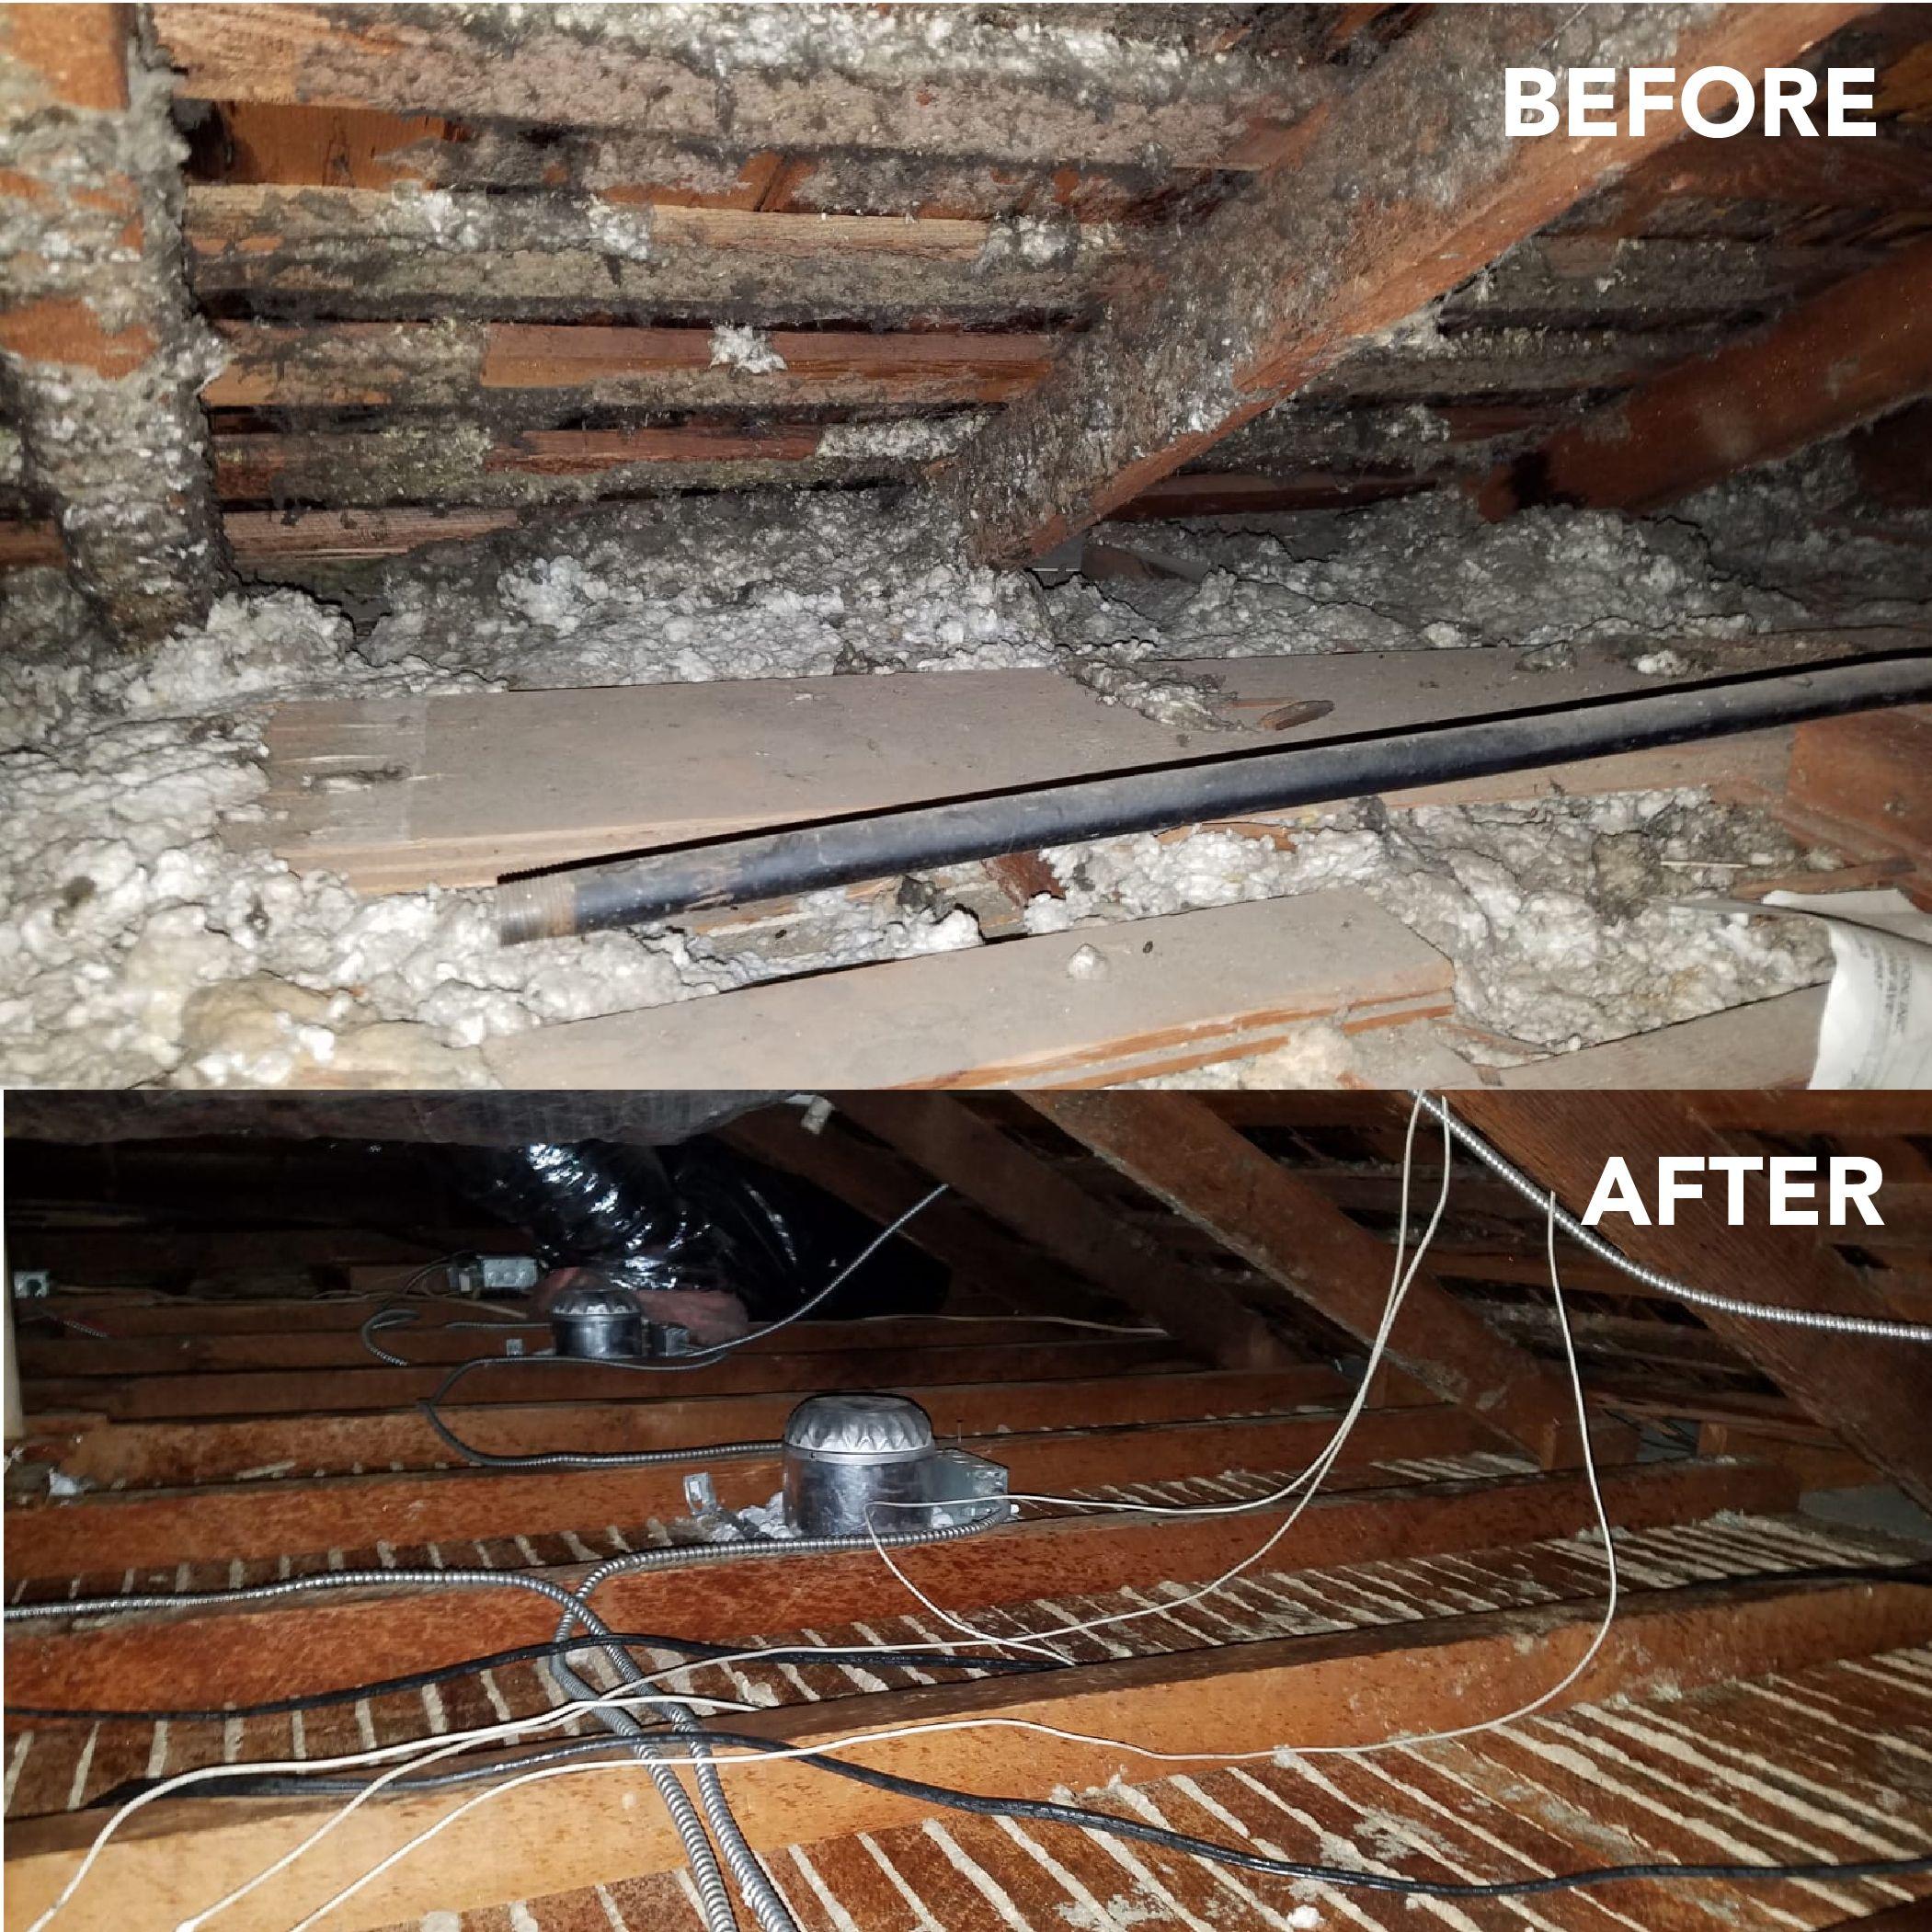 Attic decontamination rodents cleanup attic insulation